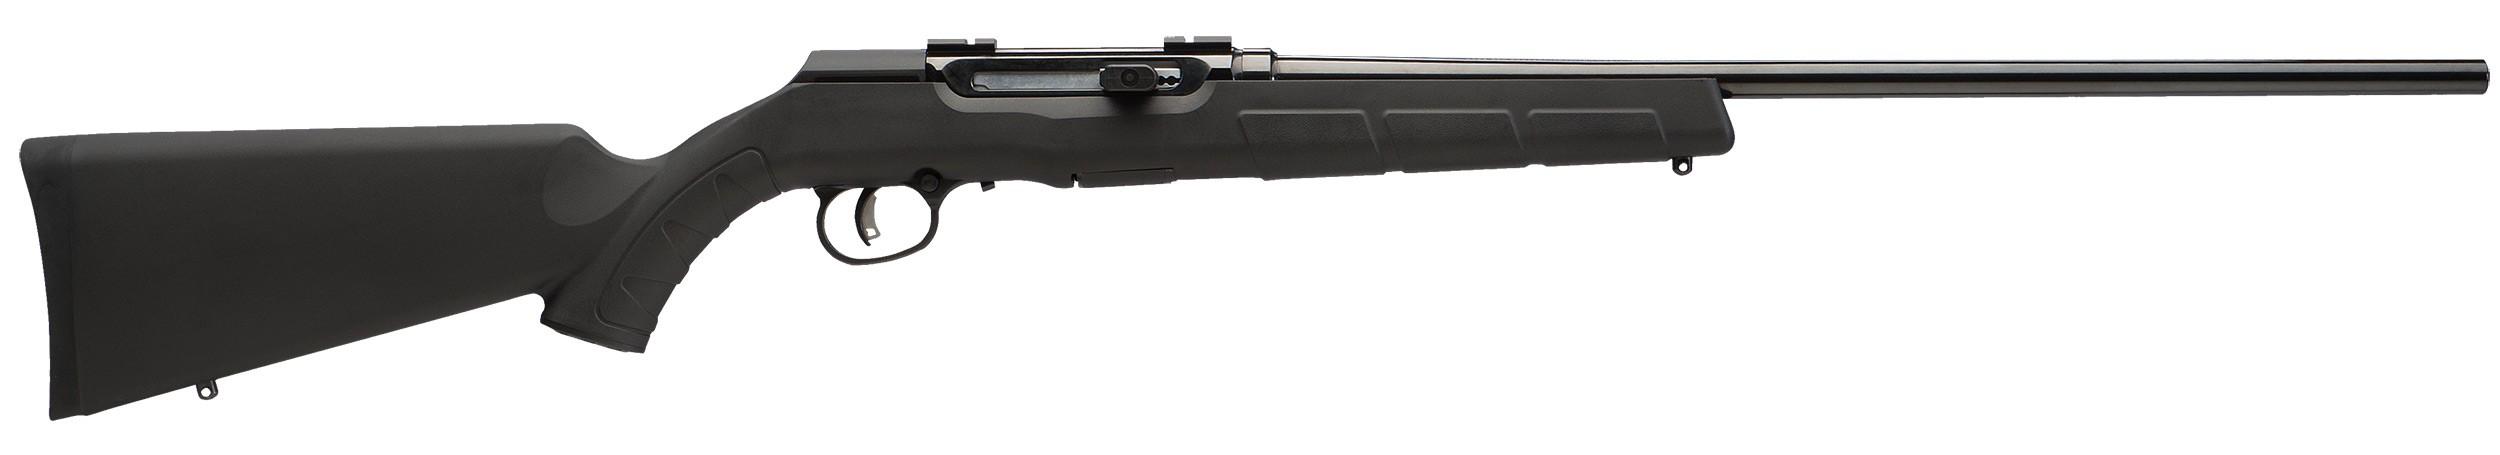 Savage A17 17 HMR Kulgevär